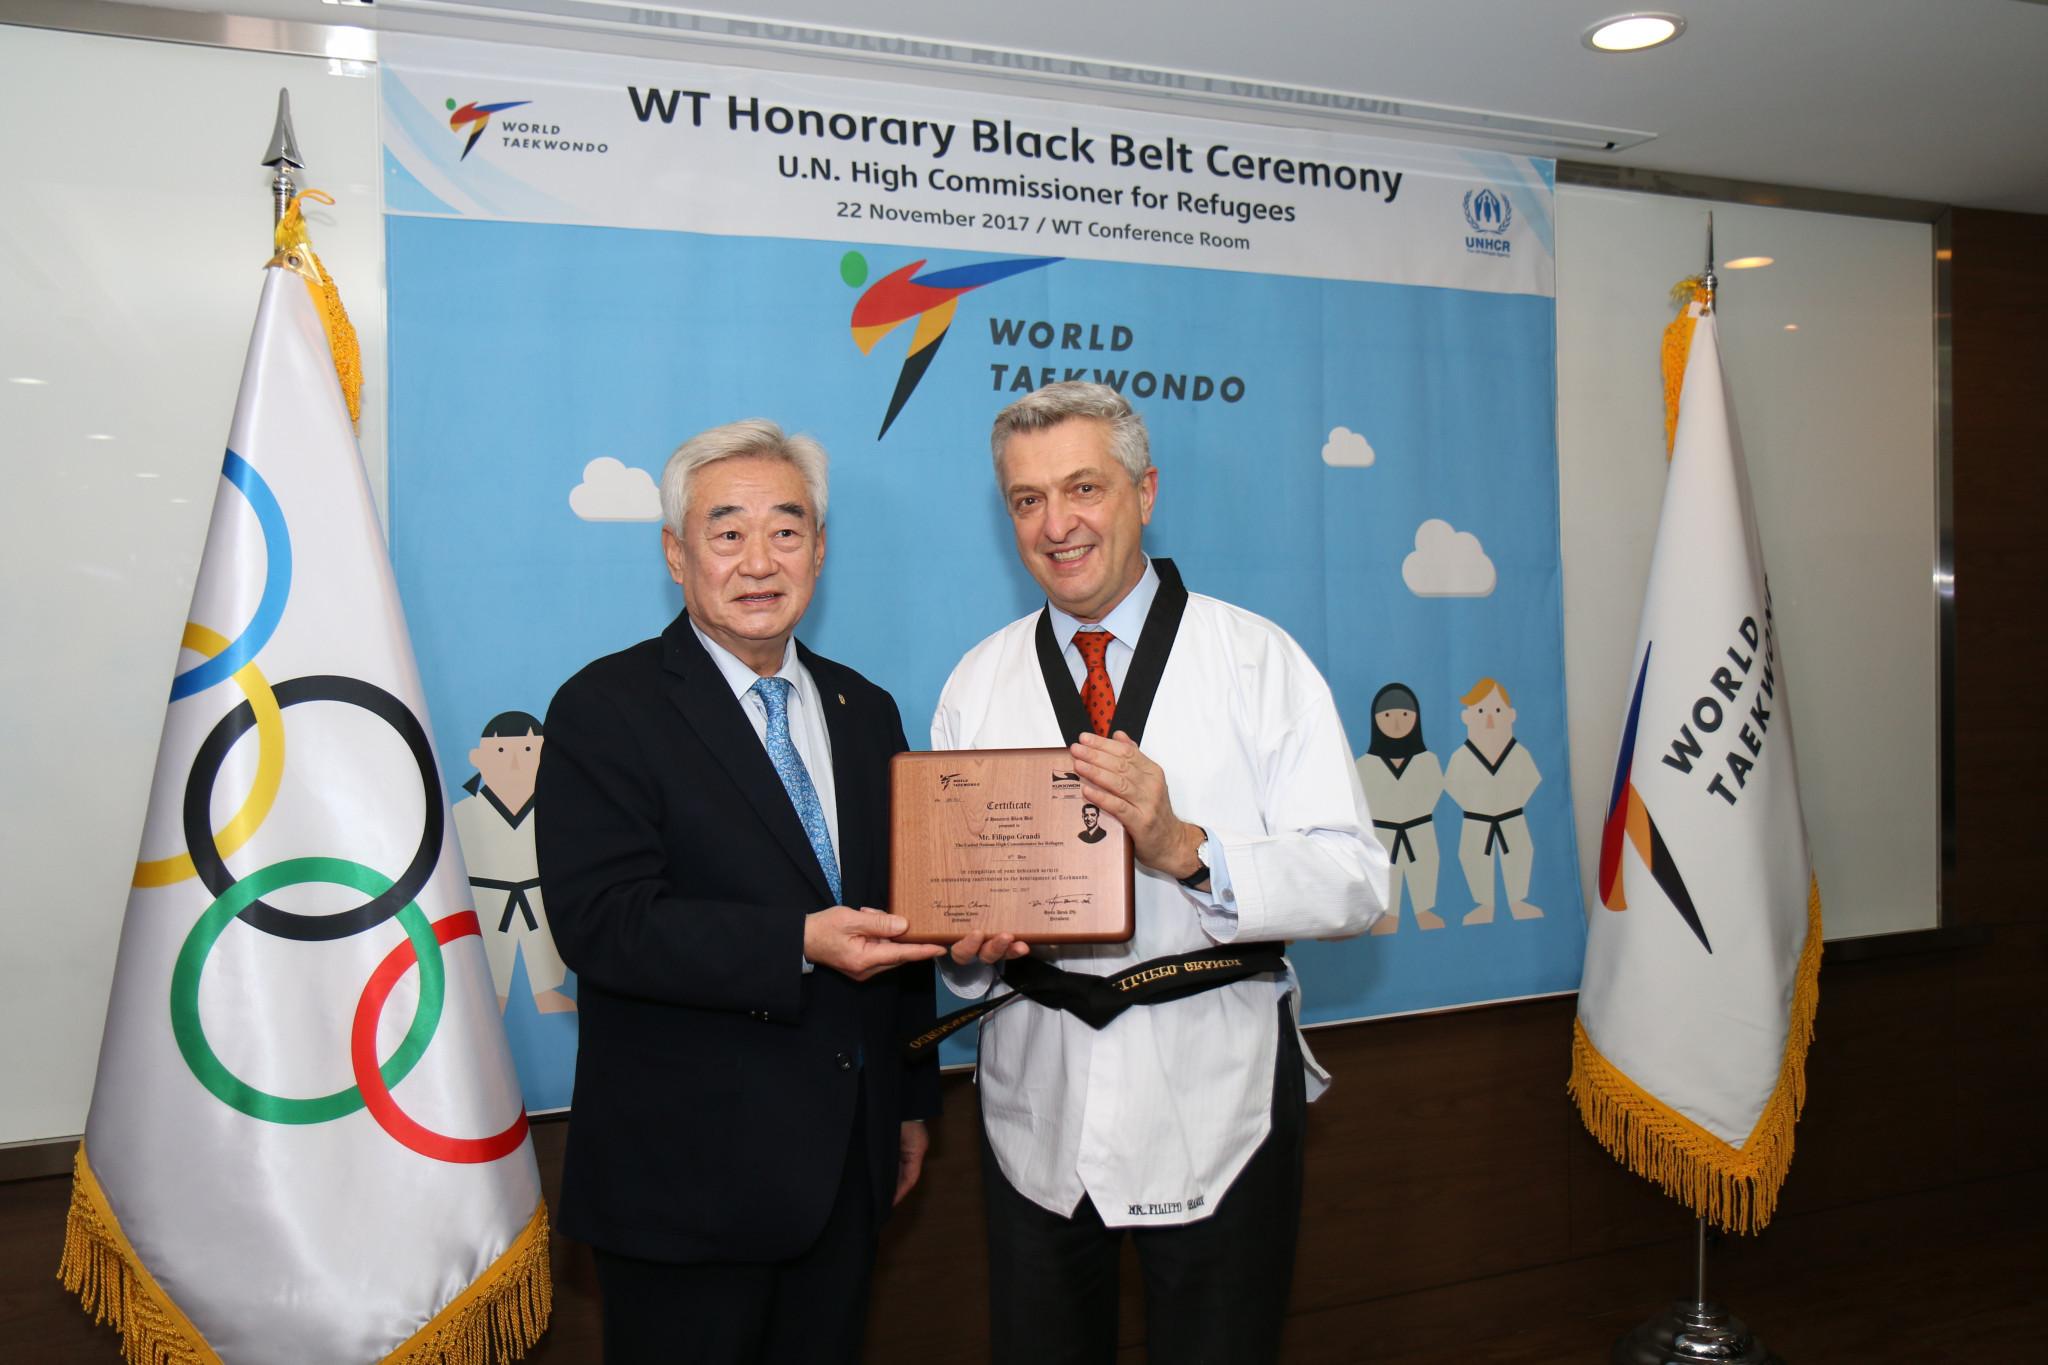 Choue awards taekwondo black belt to UNHCR High Commissioner for Refugees